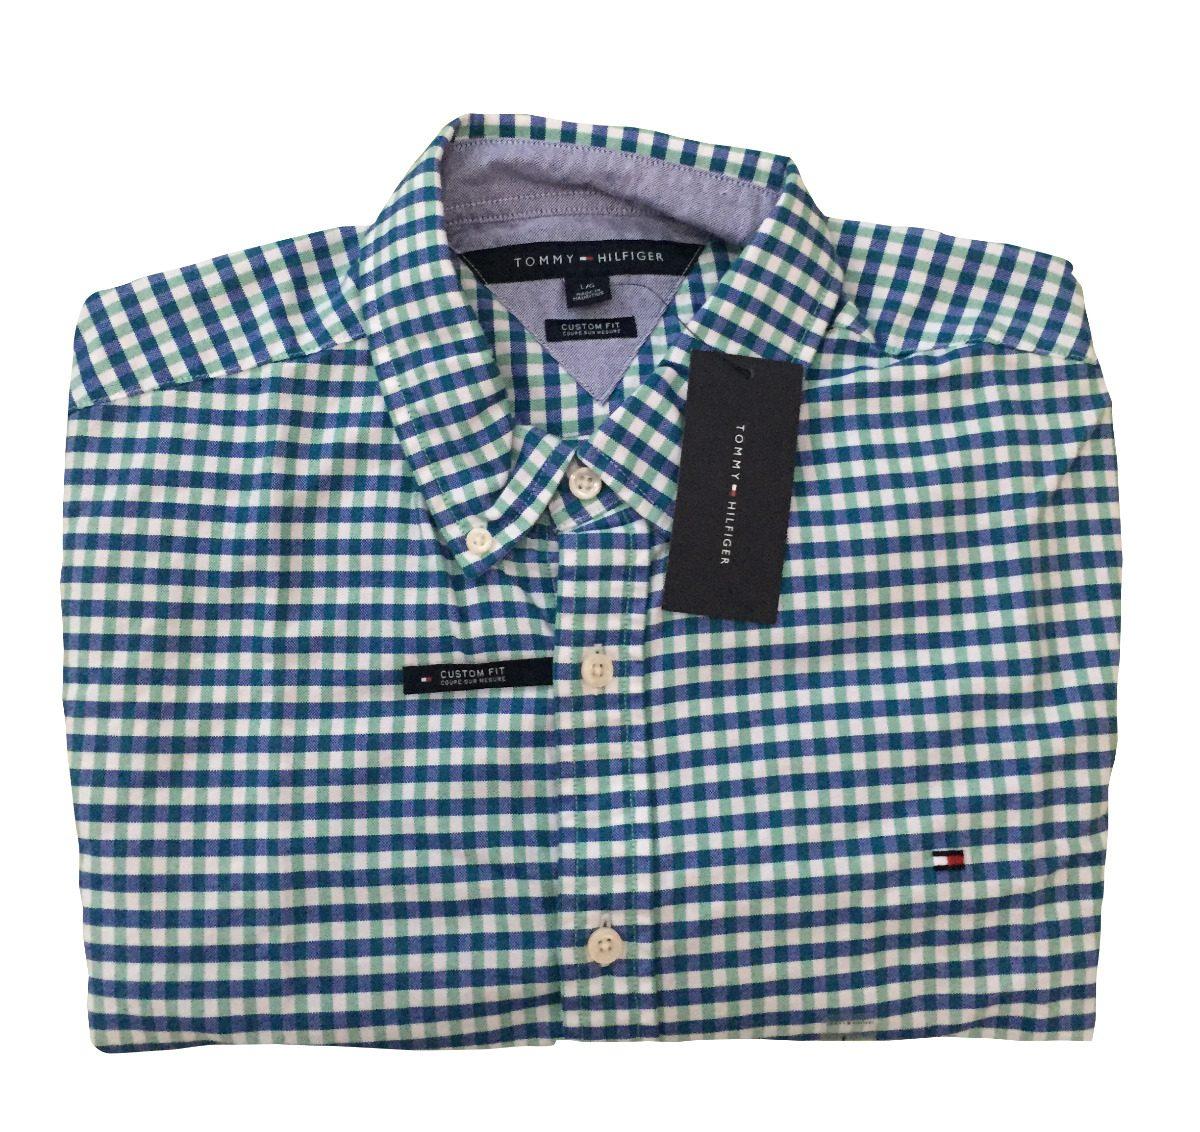 6c954217d8f48 Camisa Tommy Hilfiger Manga Larga Custom Fit Cuadros -   999.00 en ...